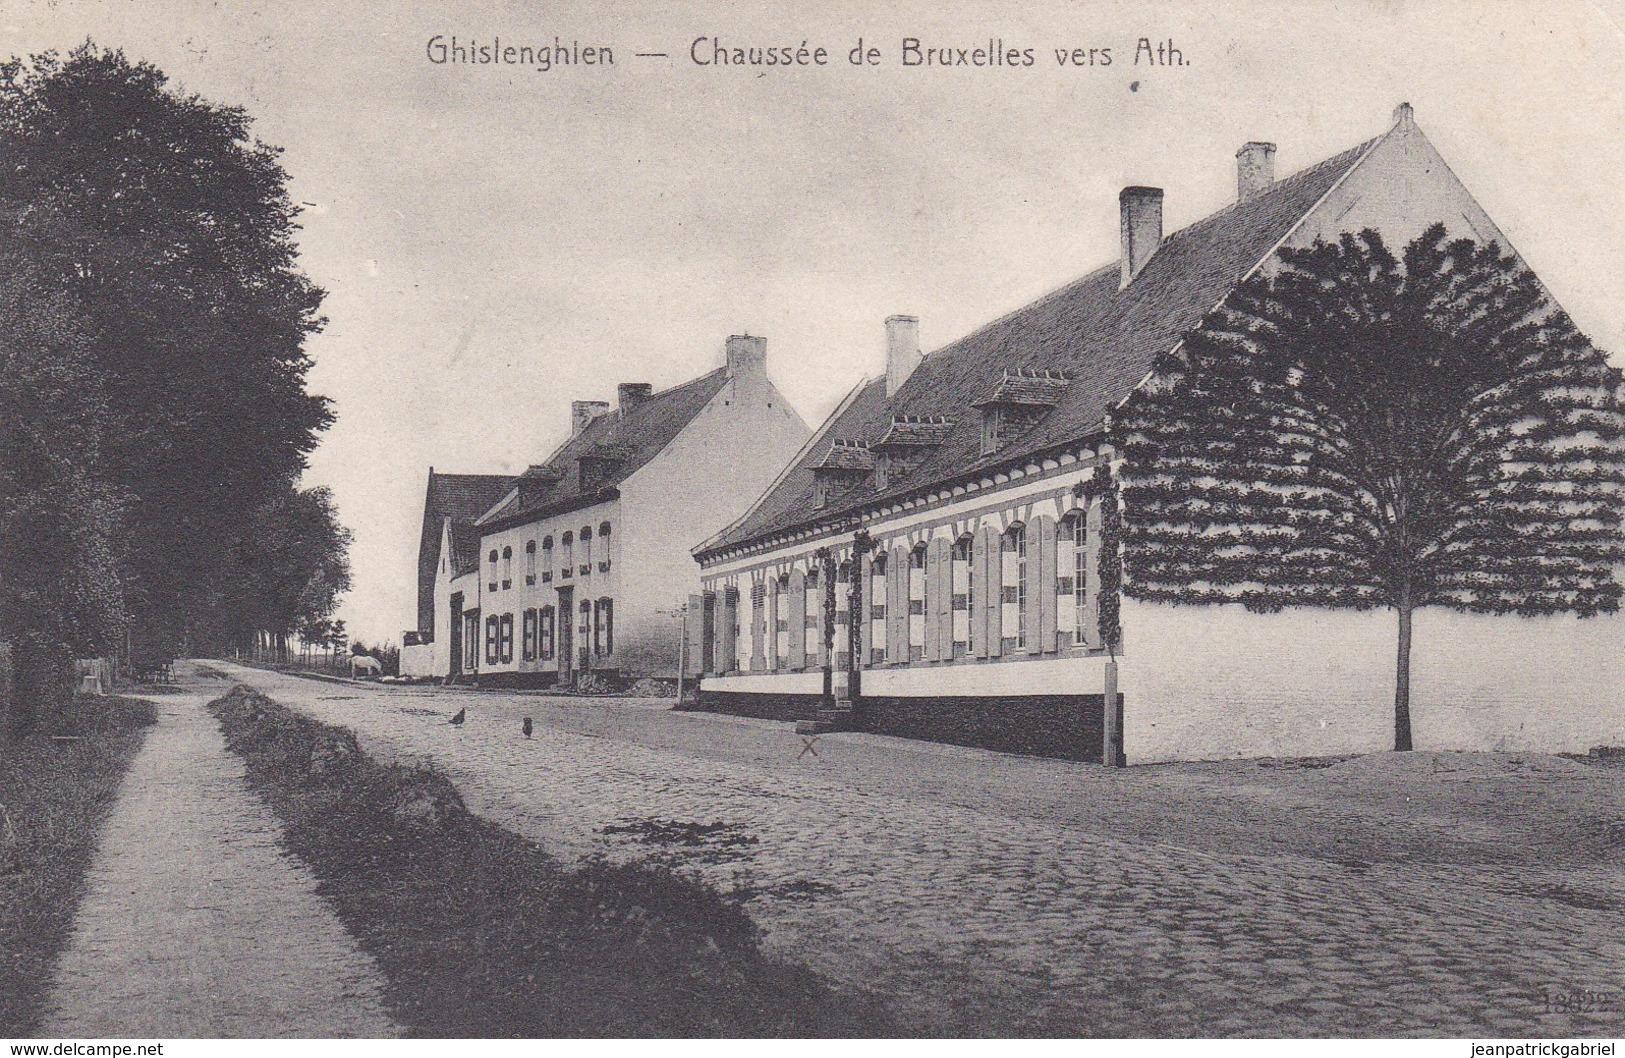 619 Ghislenghien Chaussee De Bruxelles Vers Ath - Belgium